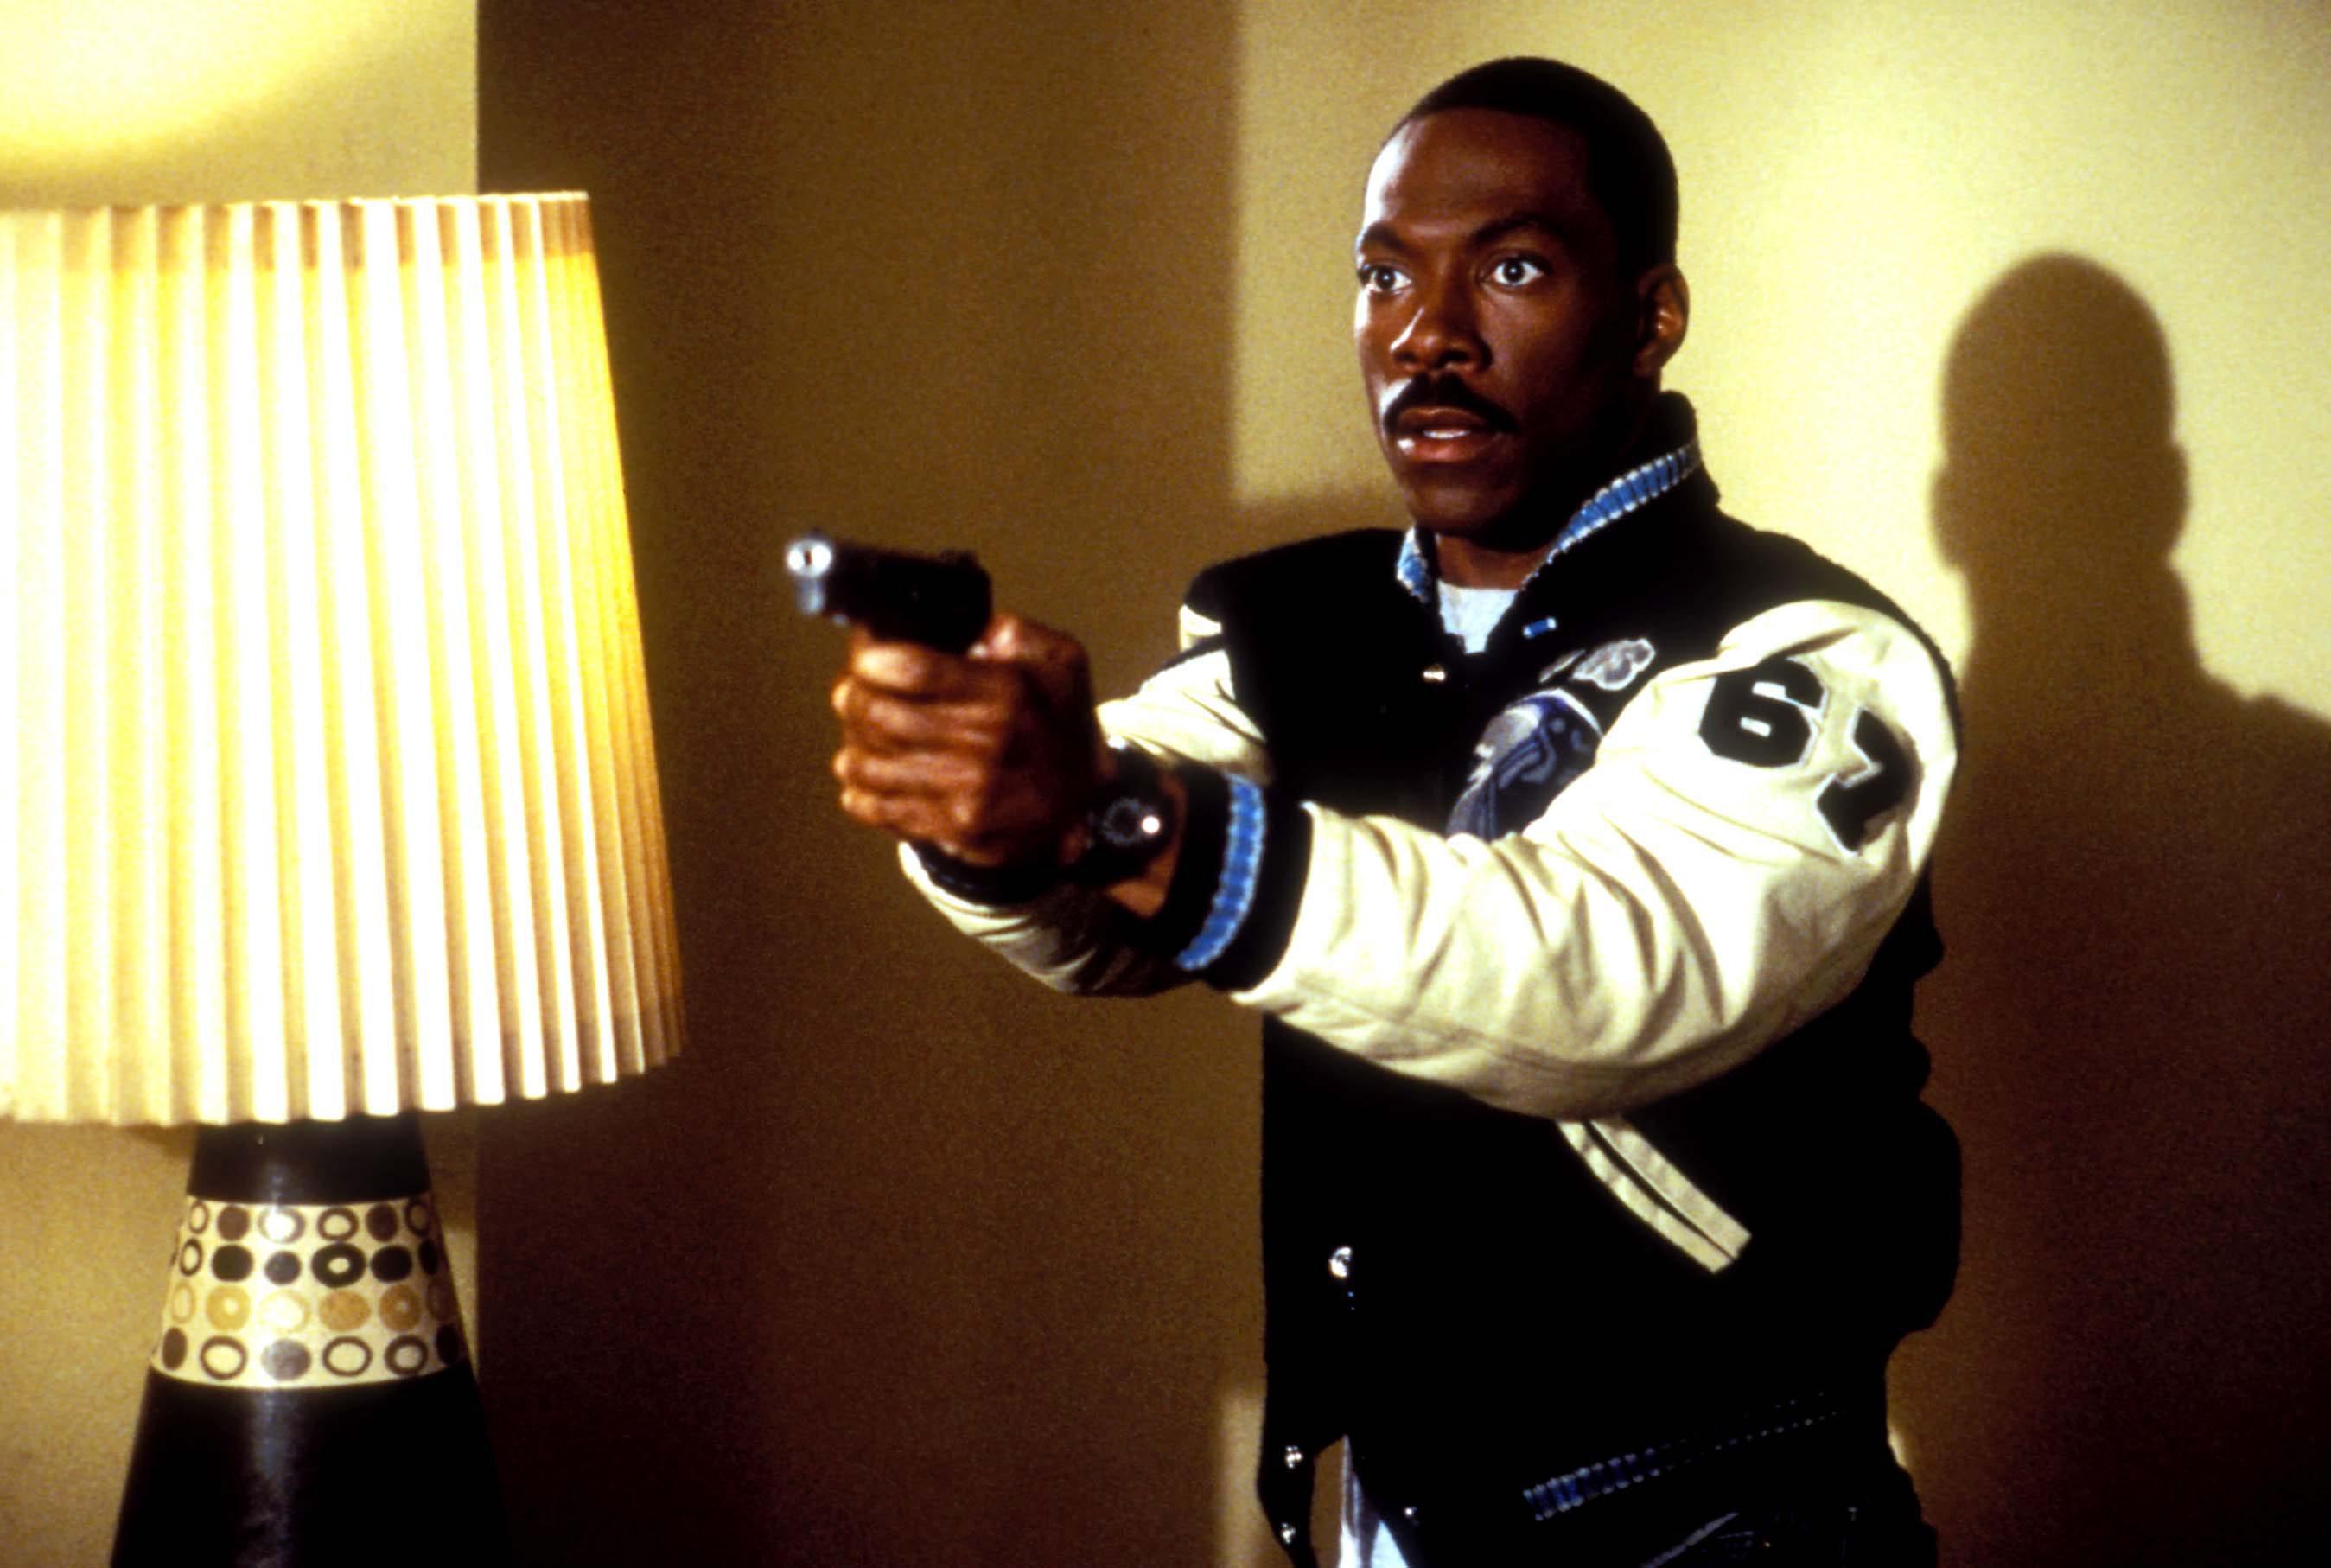 Beverly Hills Cop 2